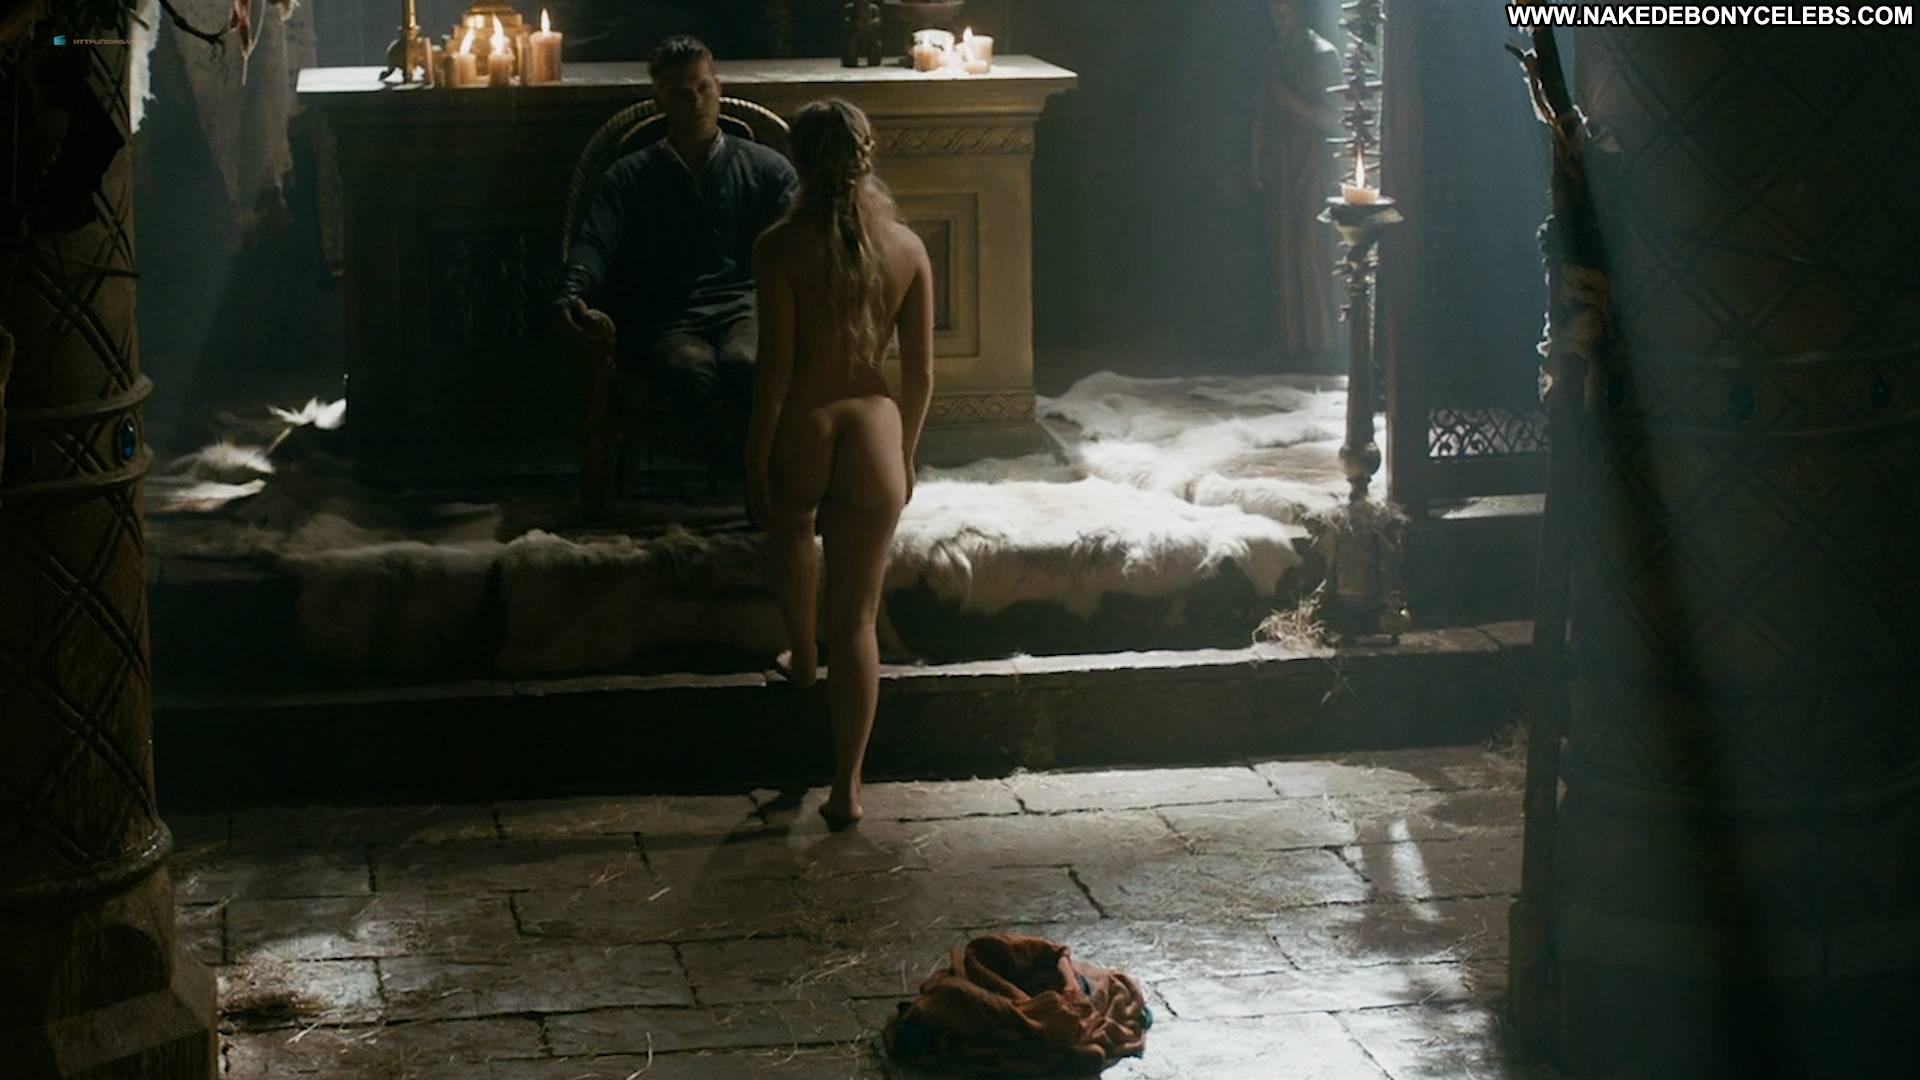 Alicia Agneson Vikings Celebrity Beautiful Babe Posing Hot Nude Hd Nipples